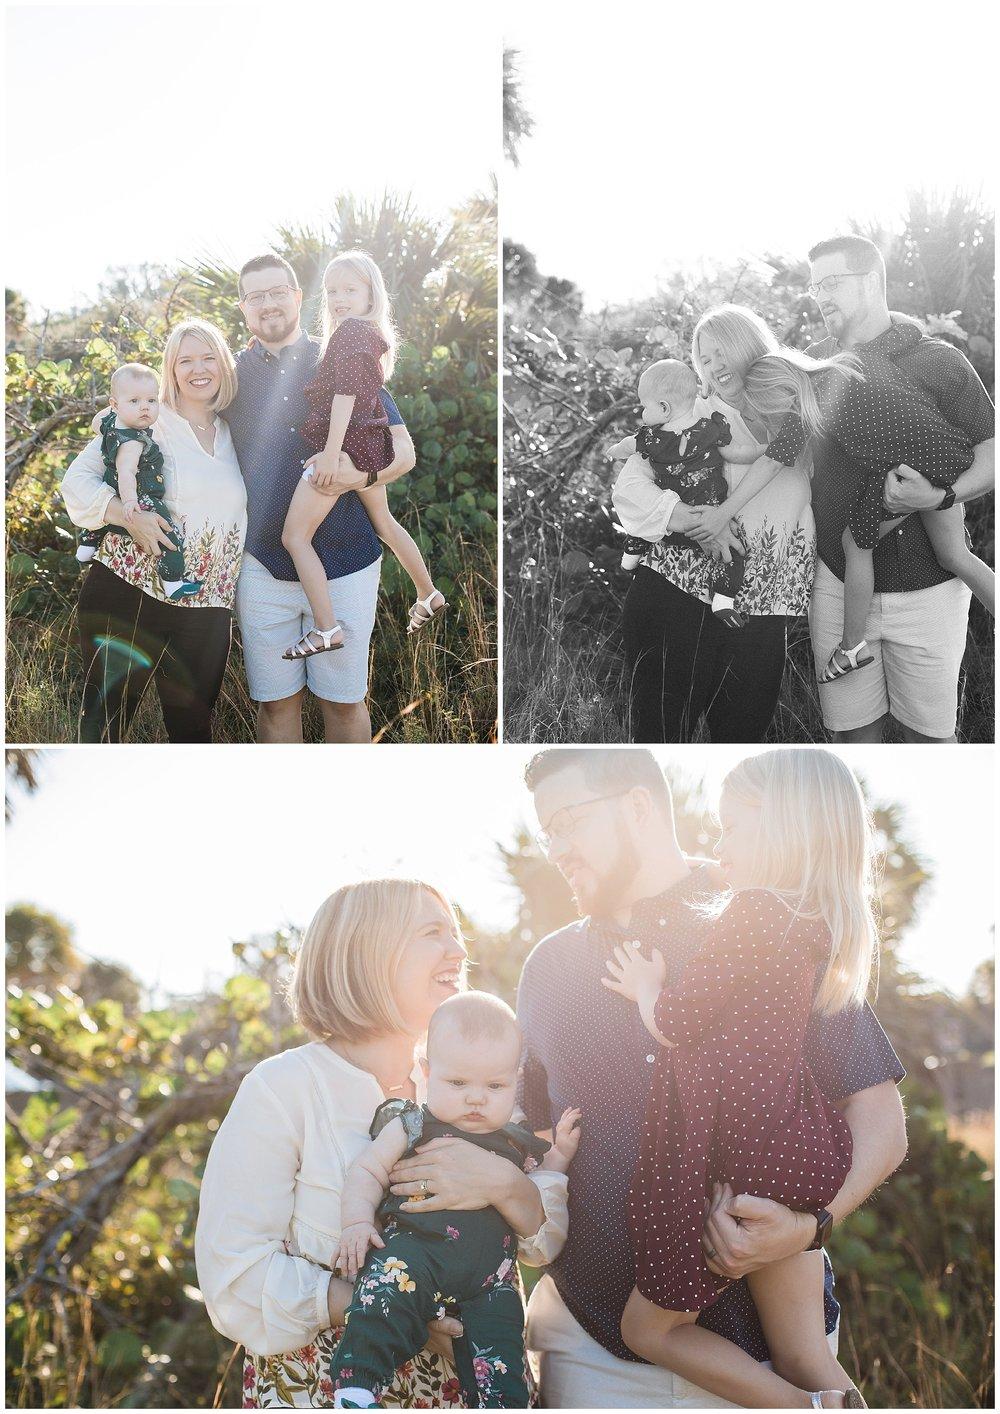 jessicafredericks_photography_family_beach_baby_clearwater_st pete beach_0002.jpg